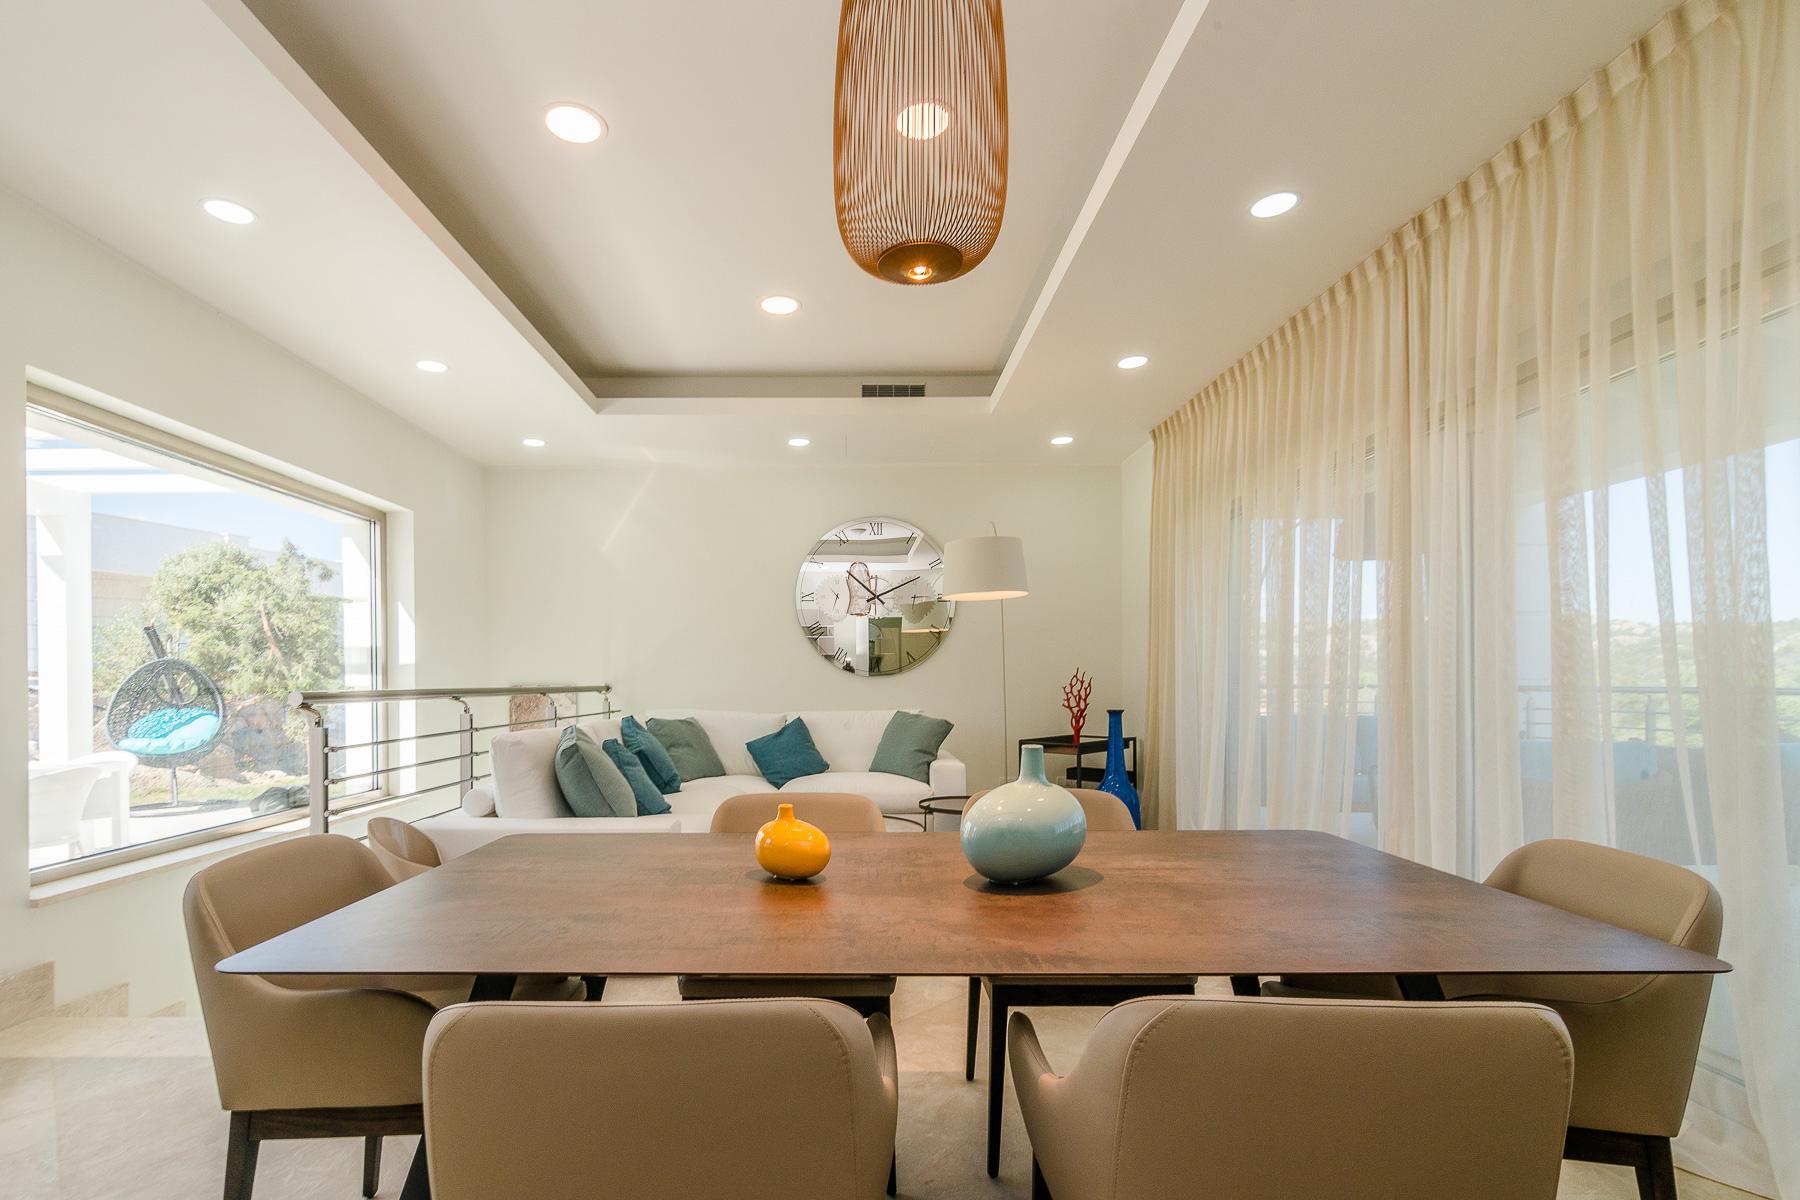 Pegasus Gorgeus Villa with swimming pool immersed in mediterranean fragrances - 3